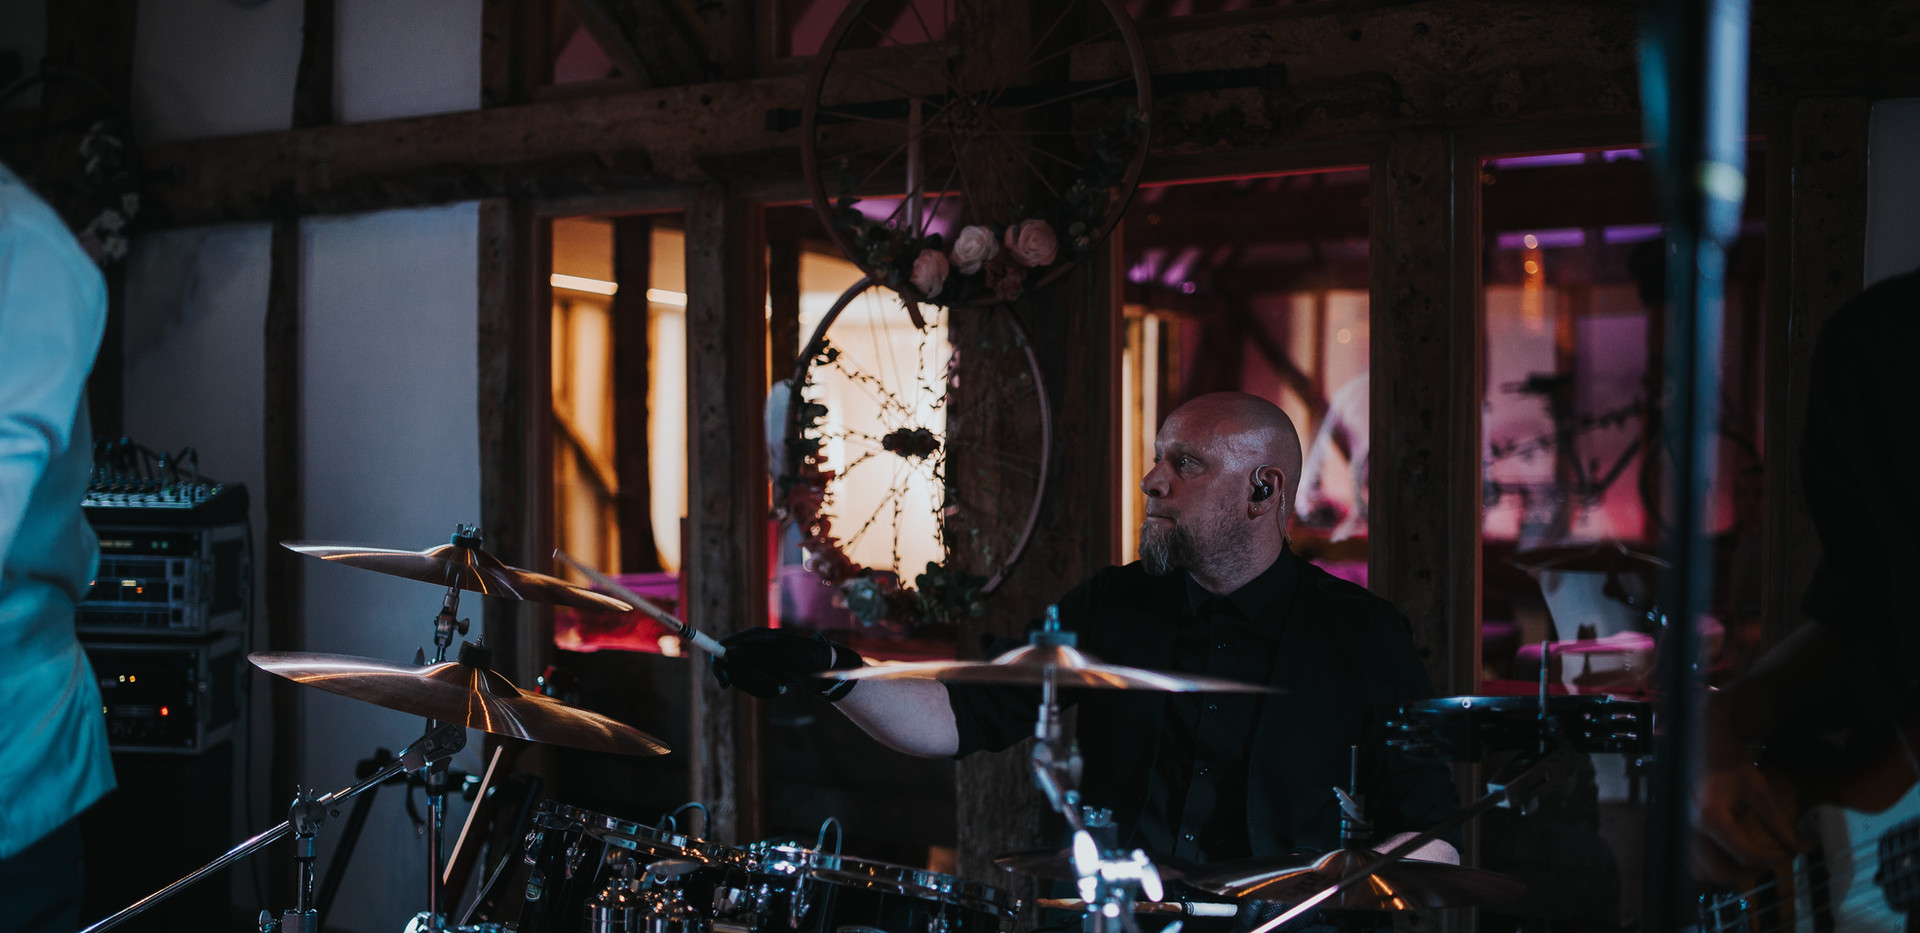 The Sam Lewis Band - South Farm - Tom Ha